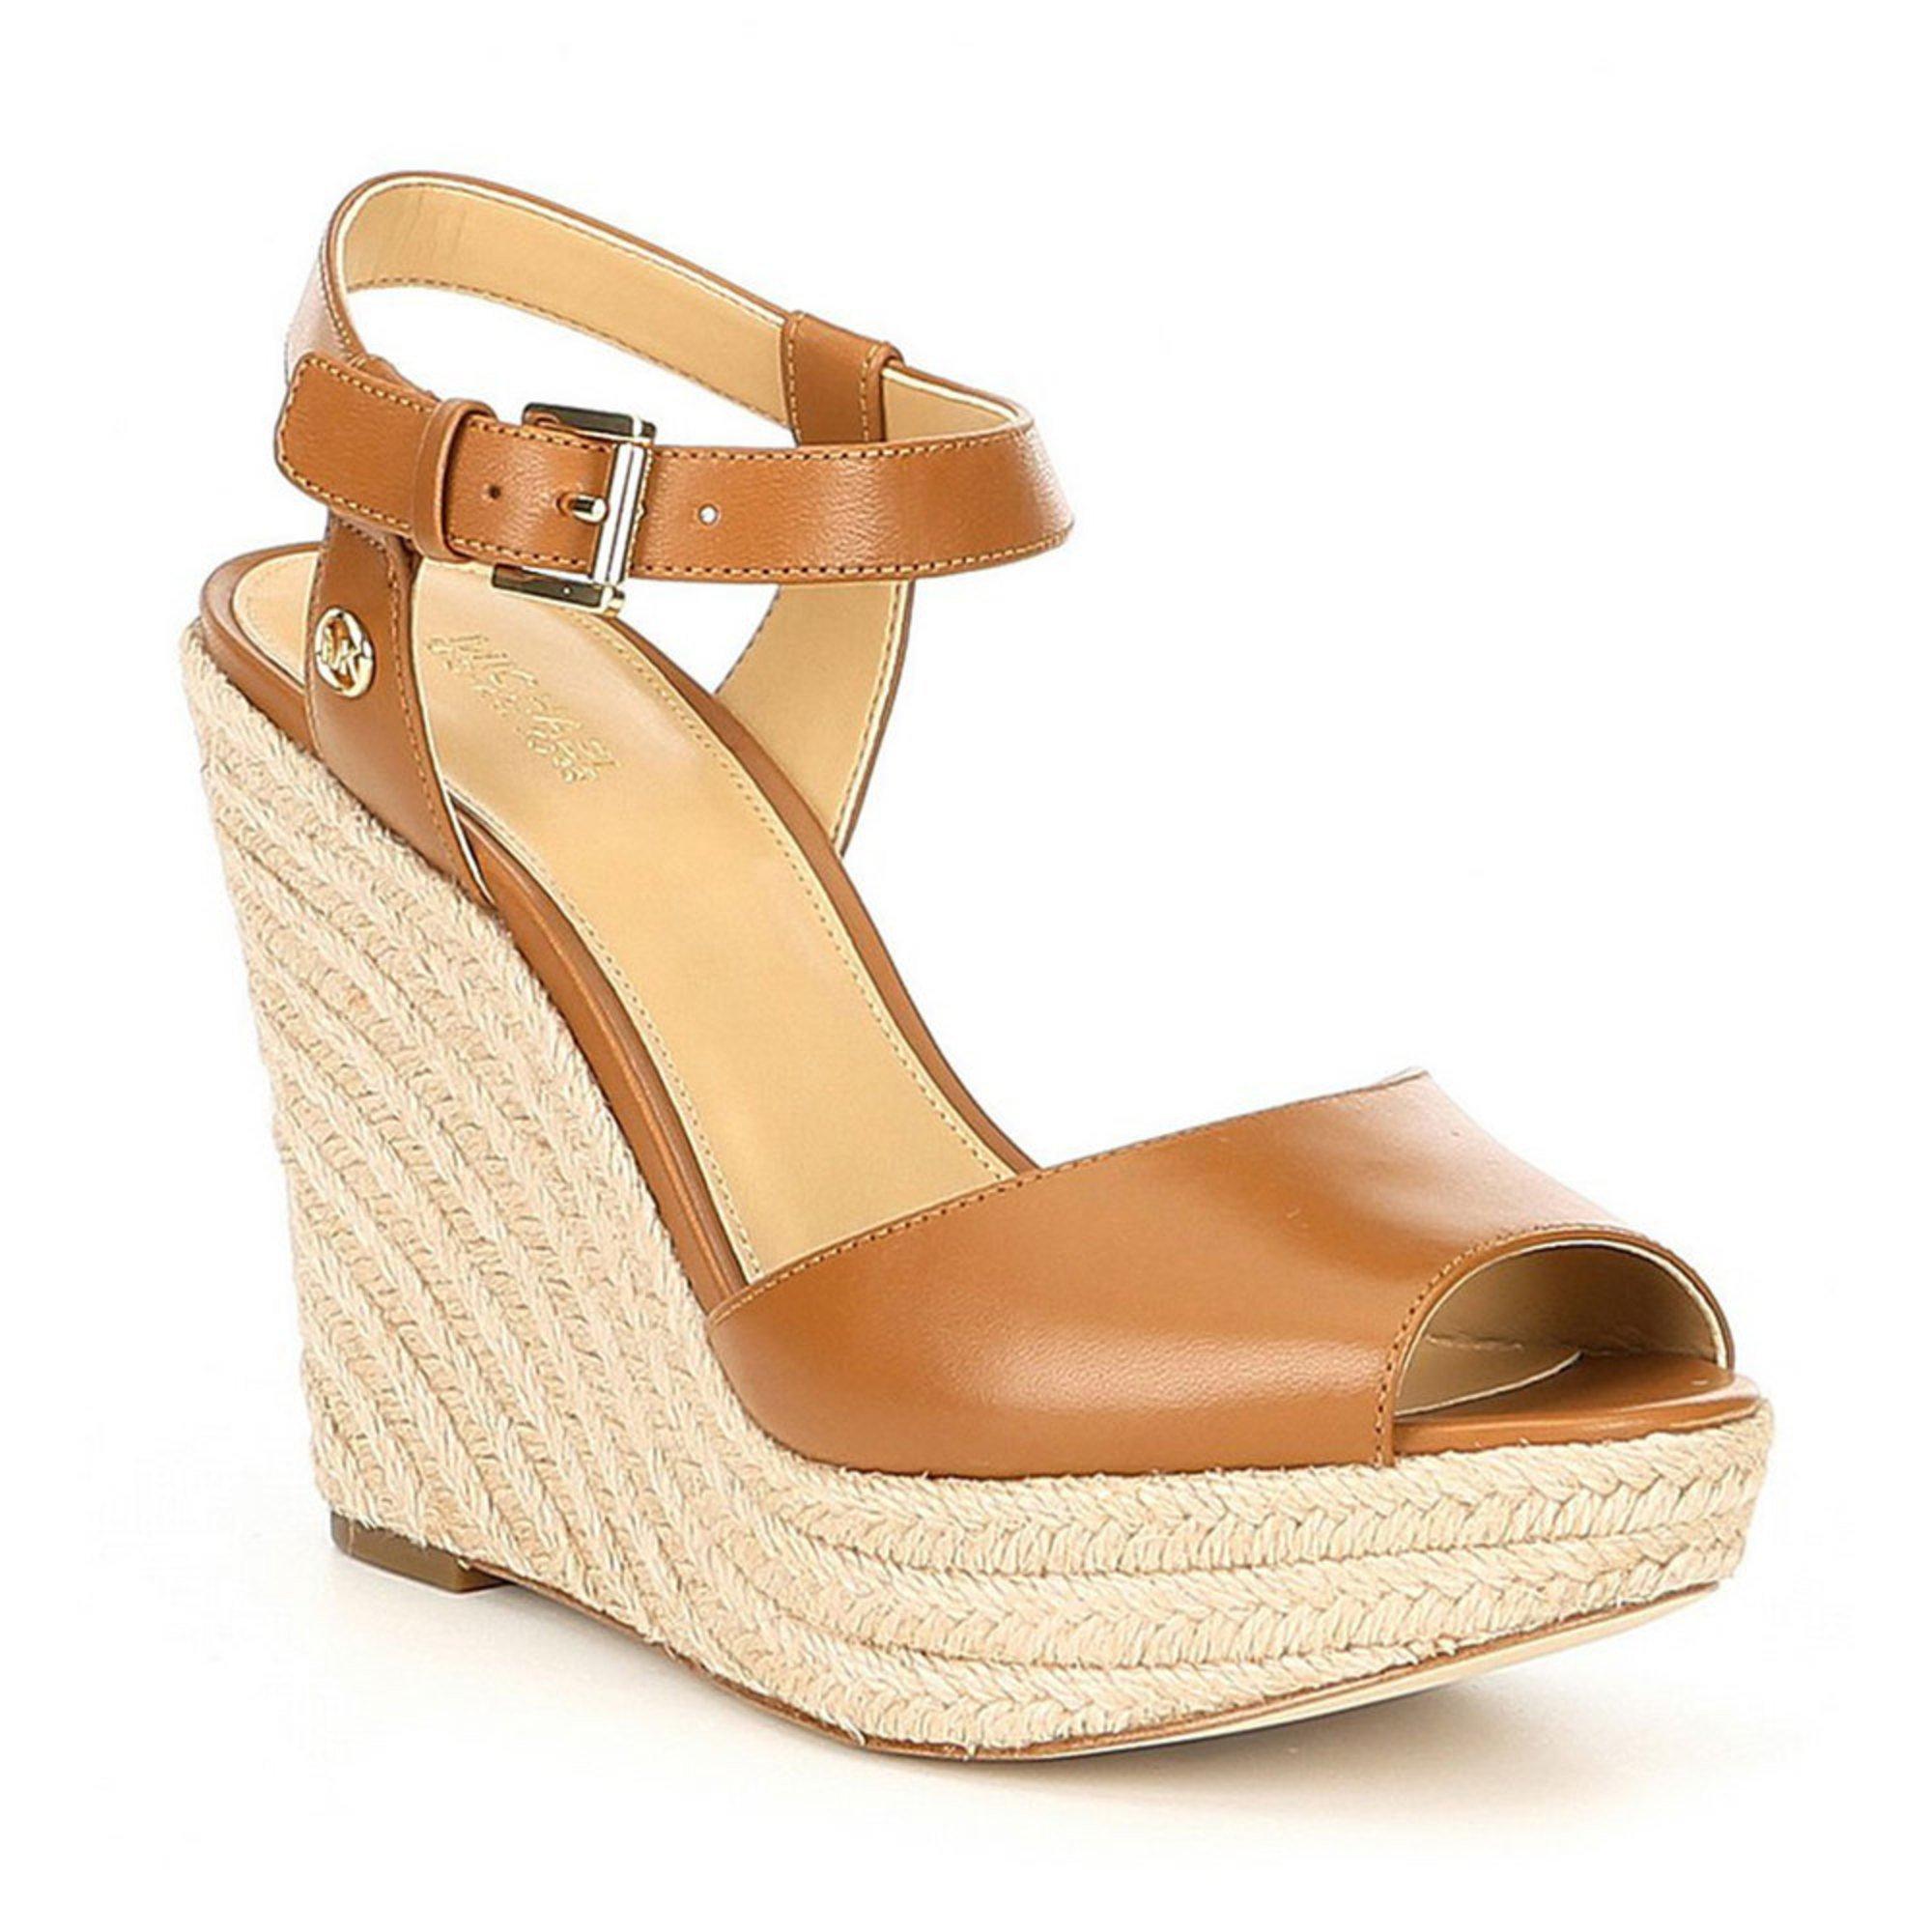 7250d21aea1d Michael Kors Women's Carolyn Wedge   Women's Heels, Pumps & Wedges ...